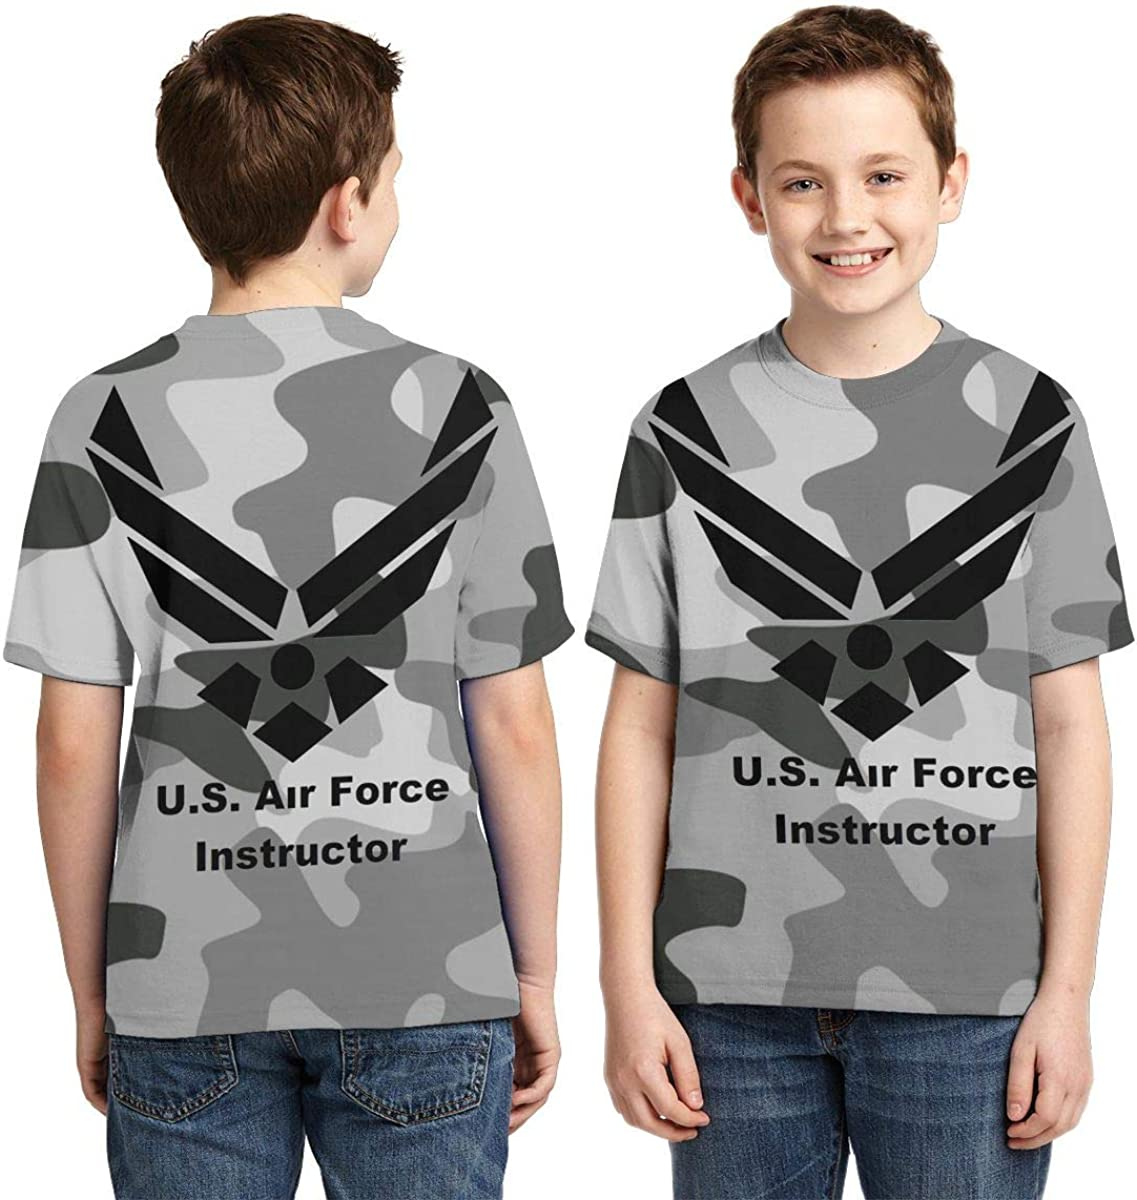 USAF Boys Shirts Kids Fashion T-Shirts Boys Girls Summer Tops